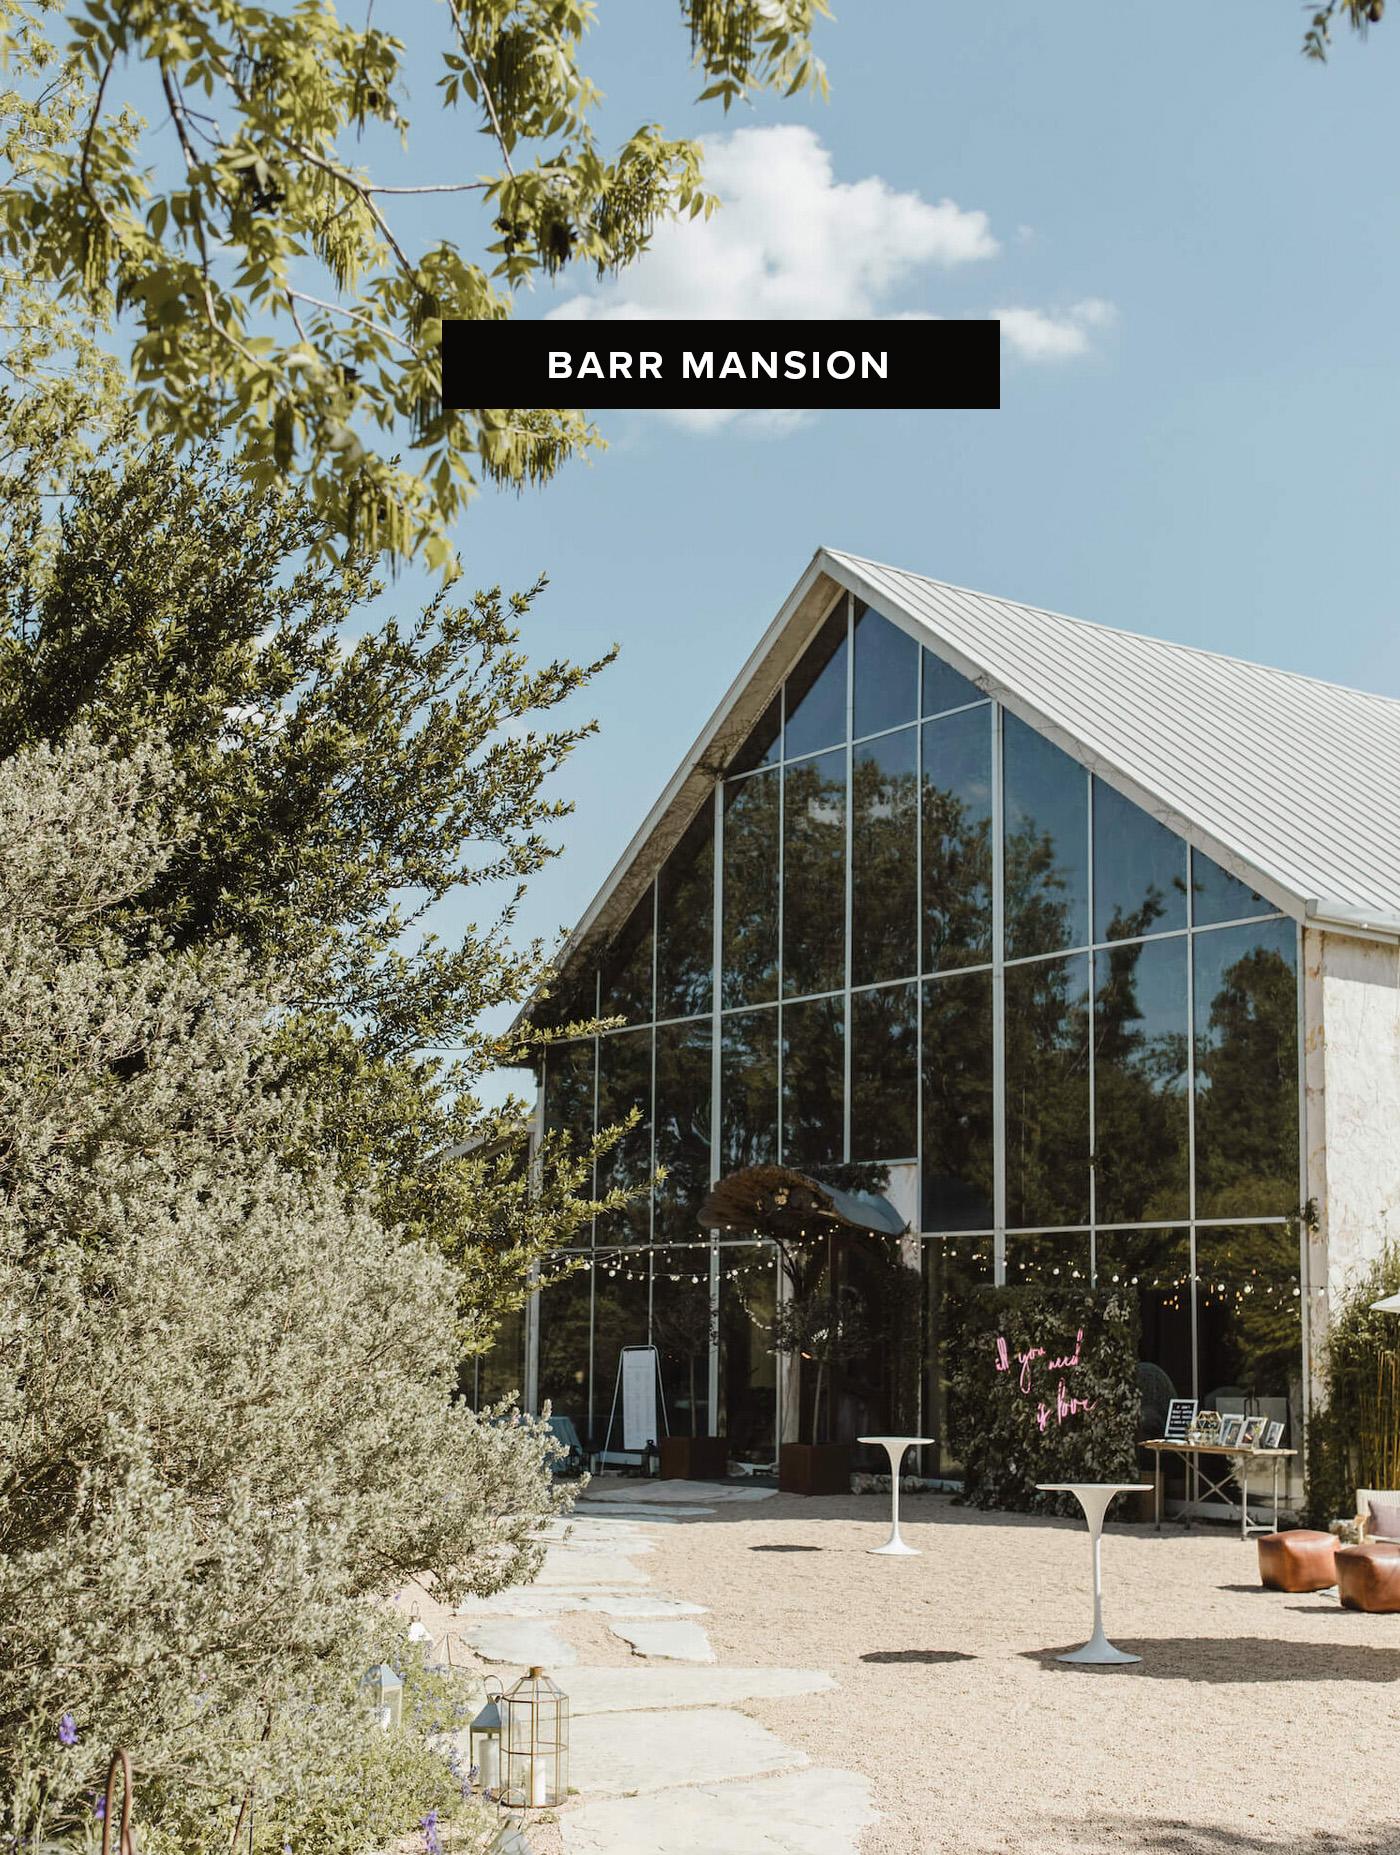 barr mansion wedding venue